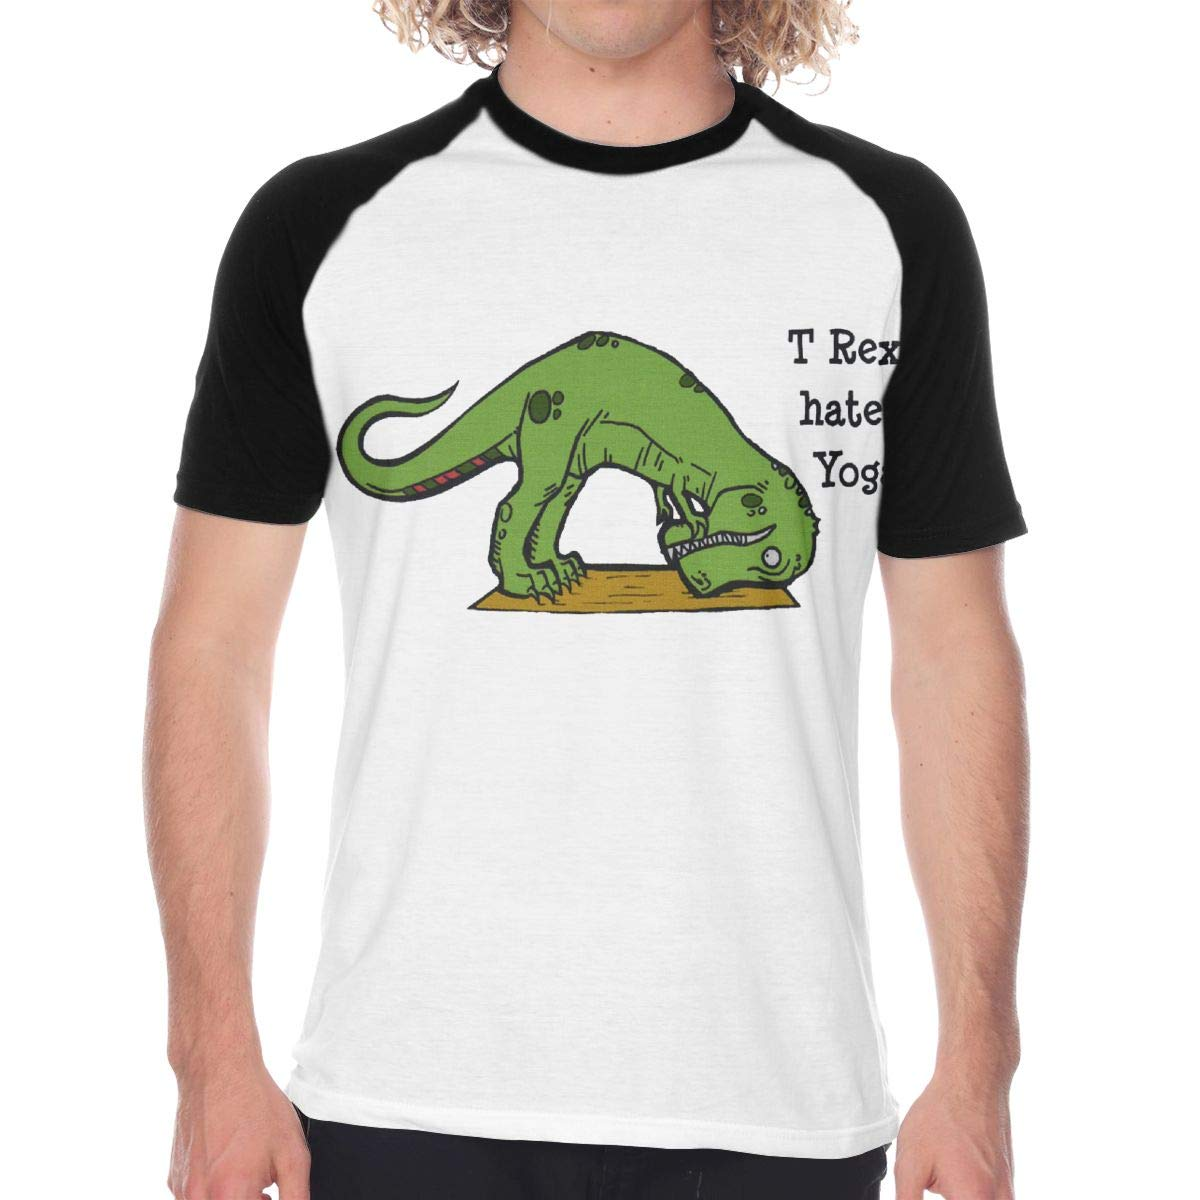 Mens Casual Short Sleeve Baseball Jersey T Rex Hates Yoga ...